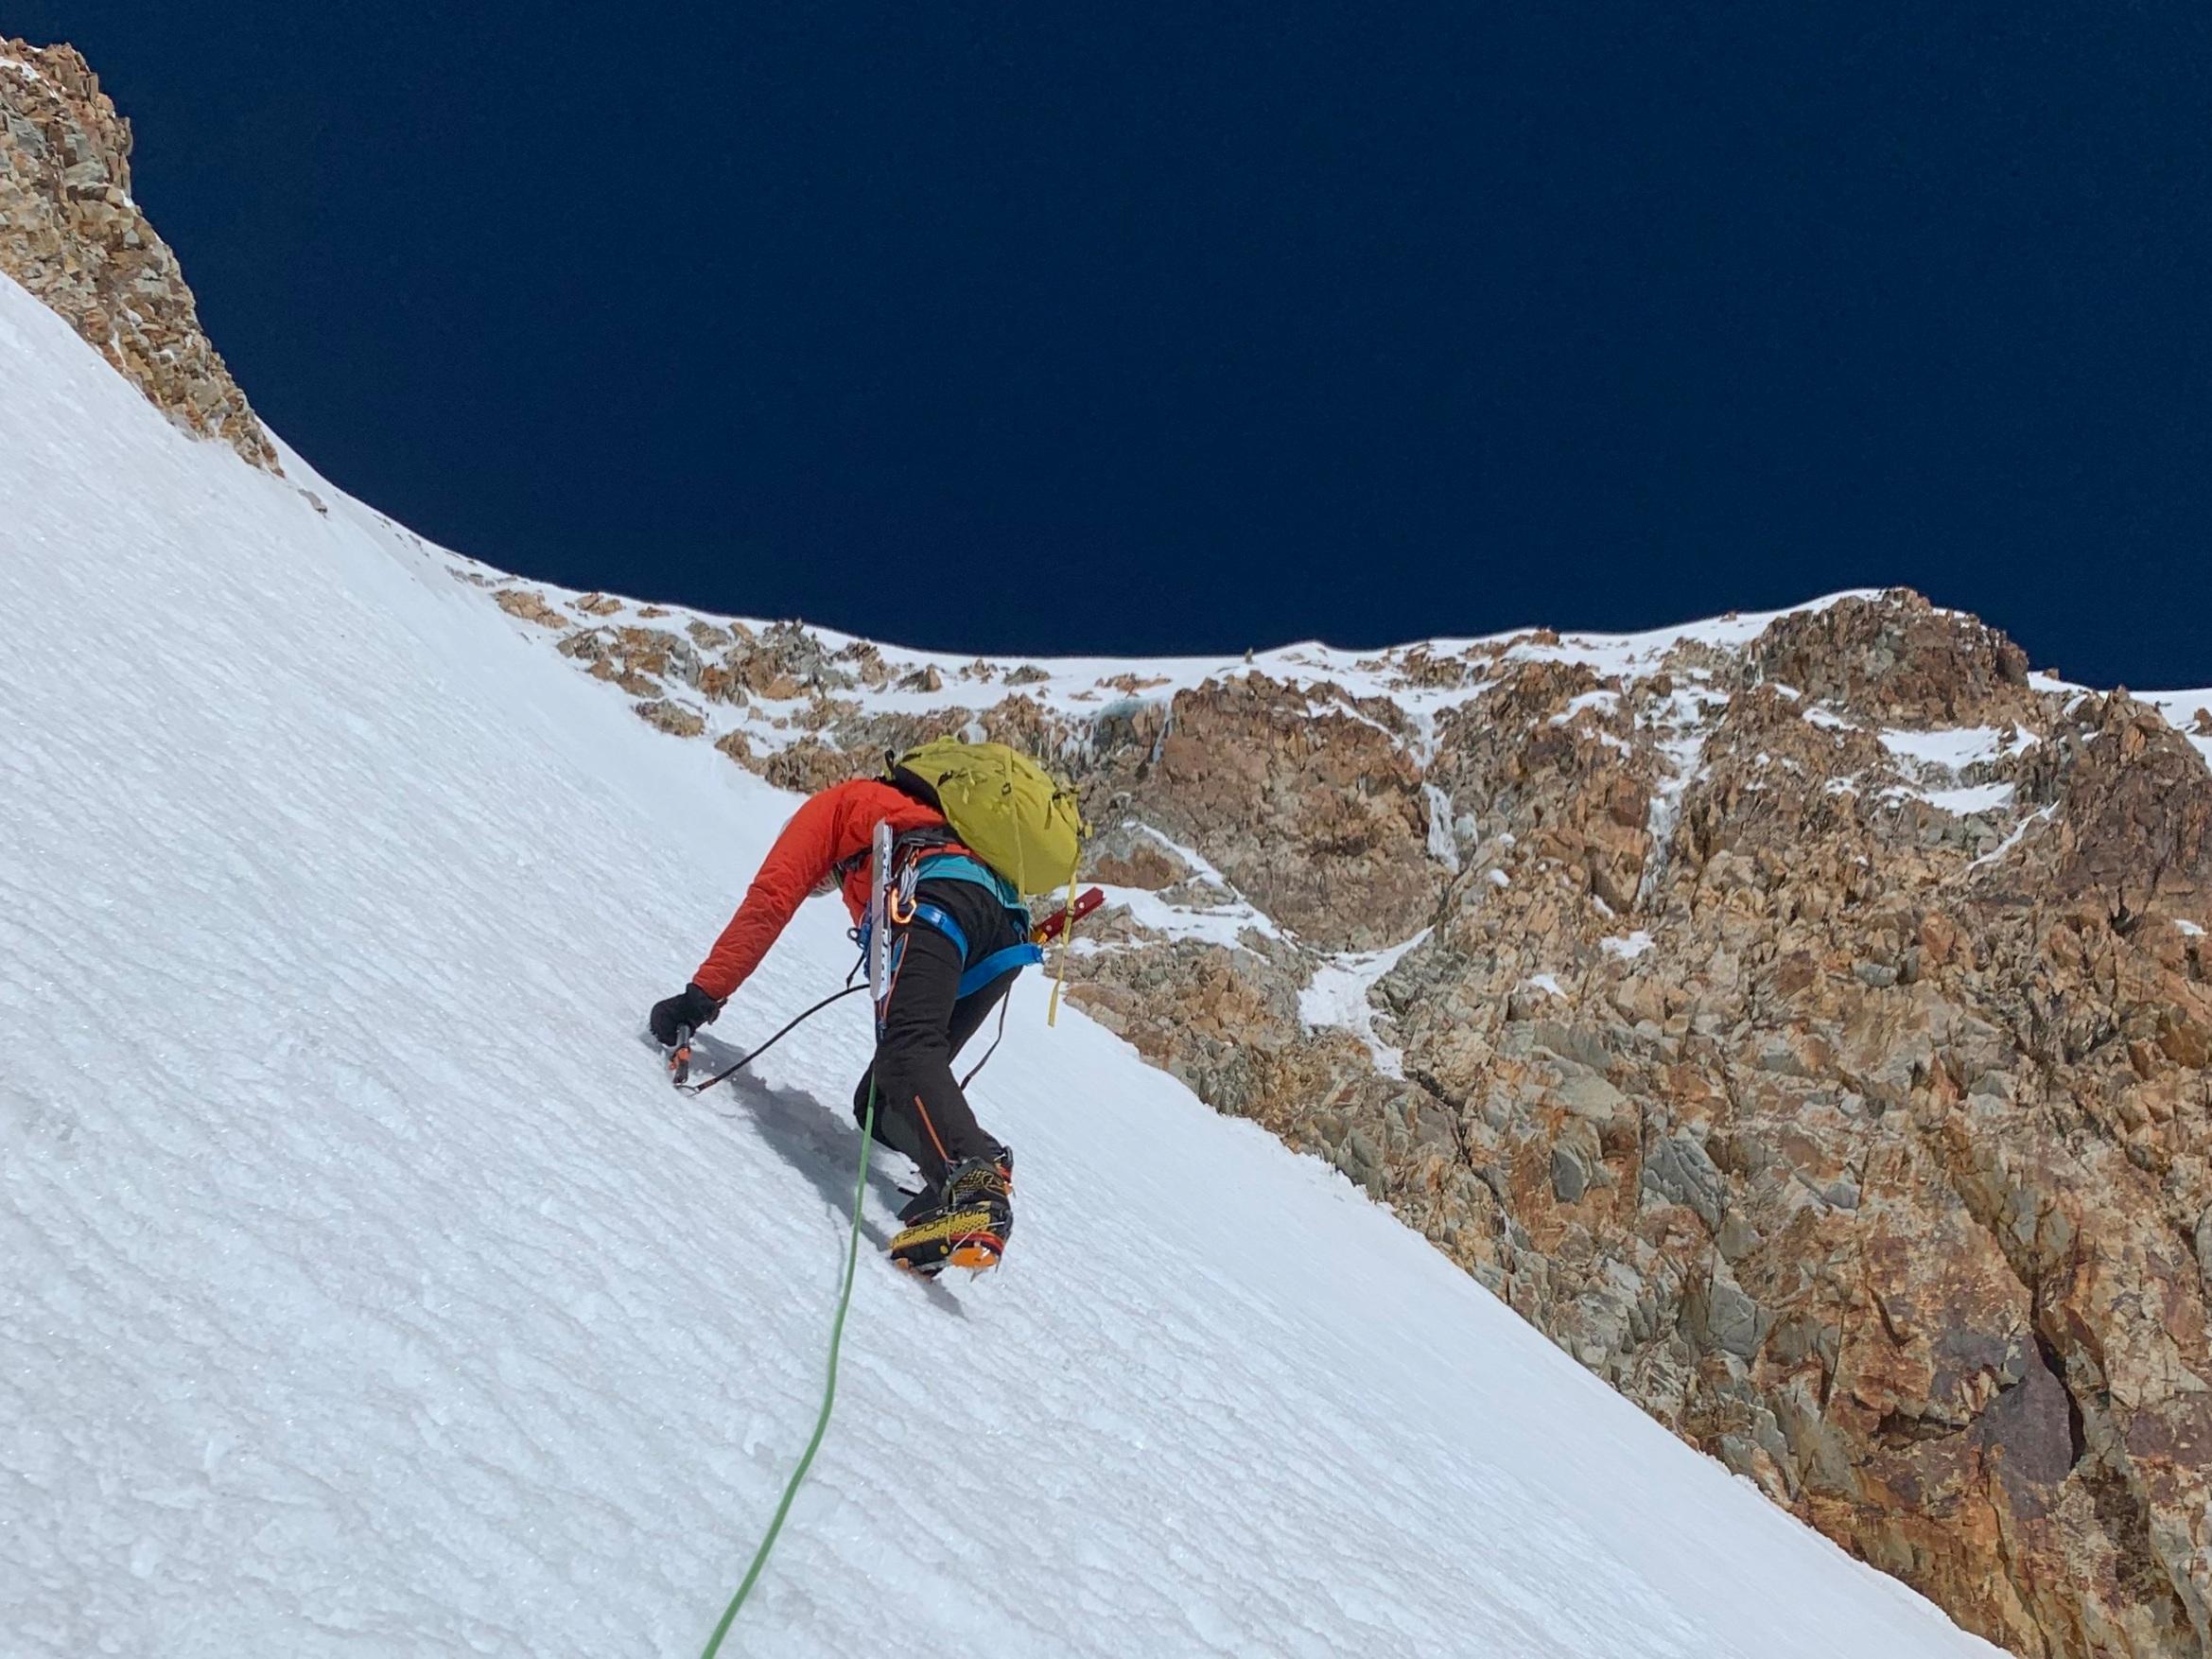 Down-climbing the headwall